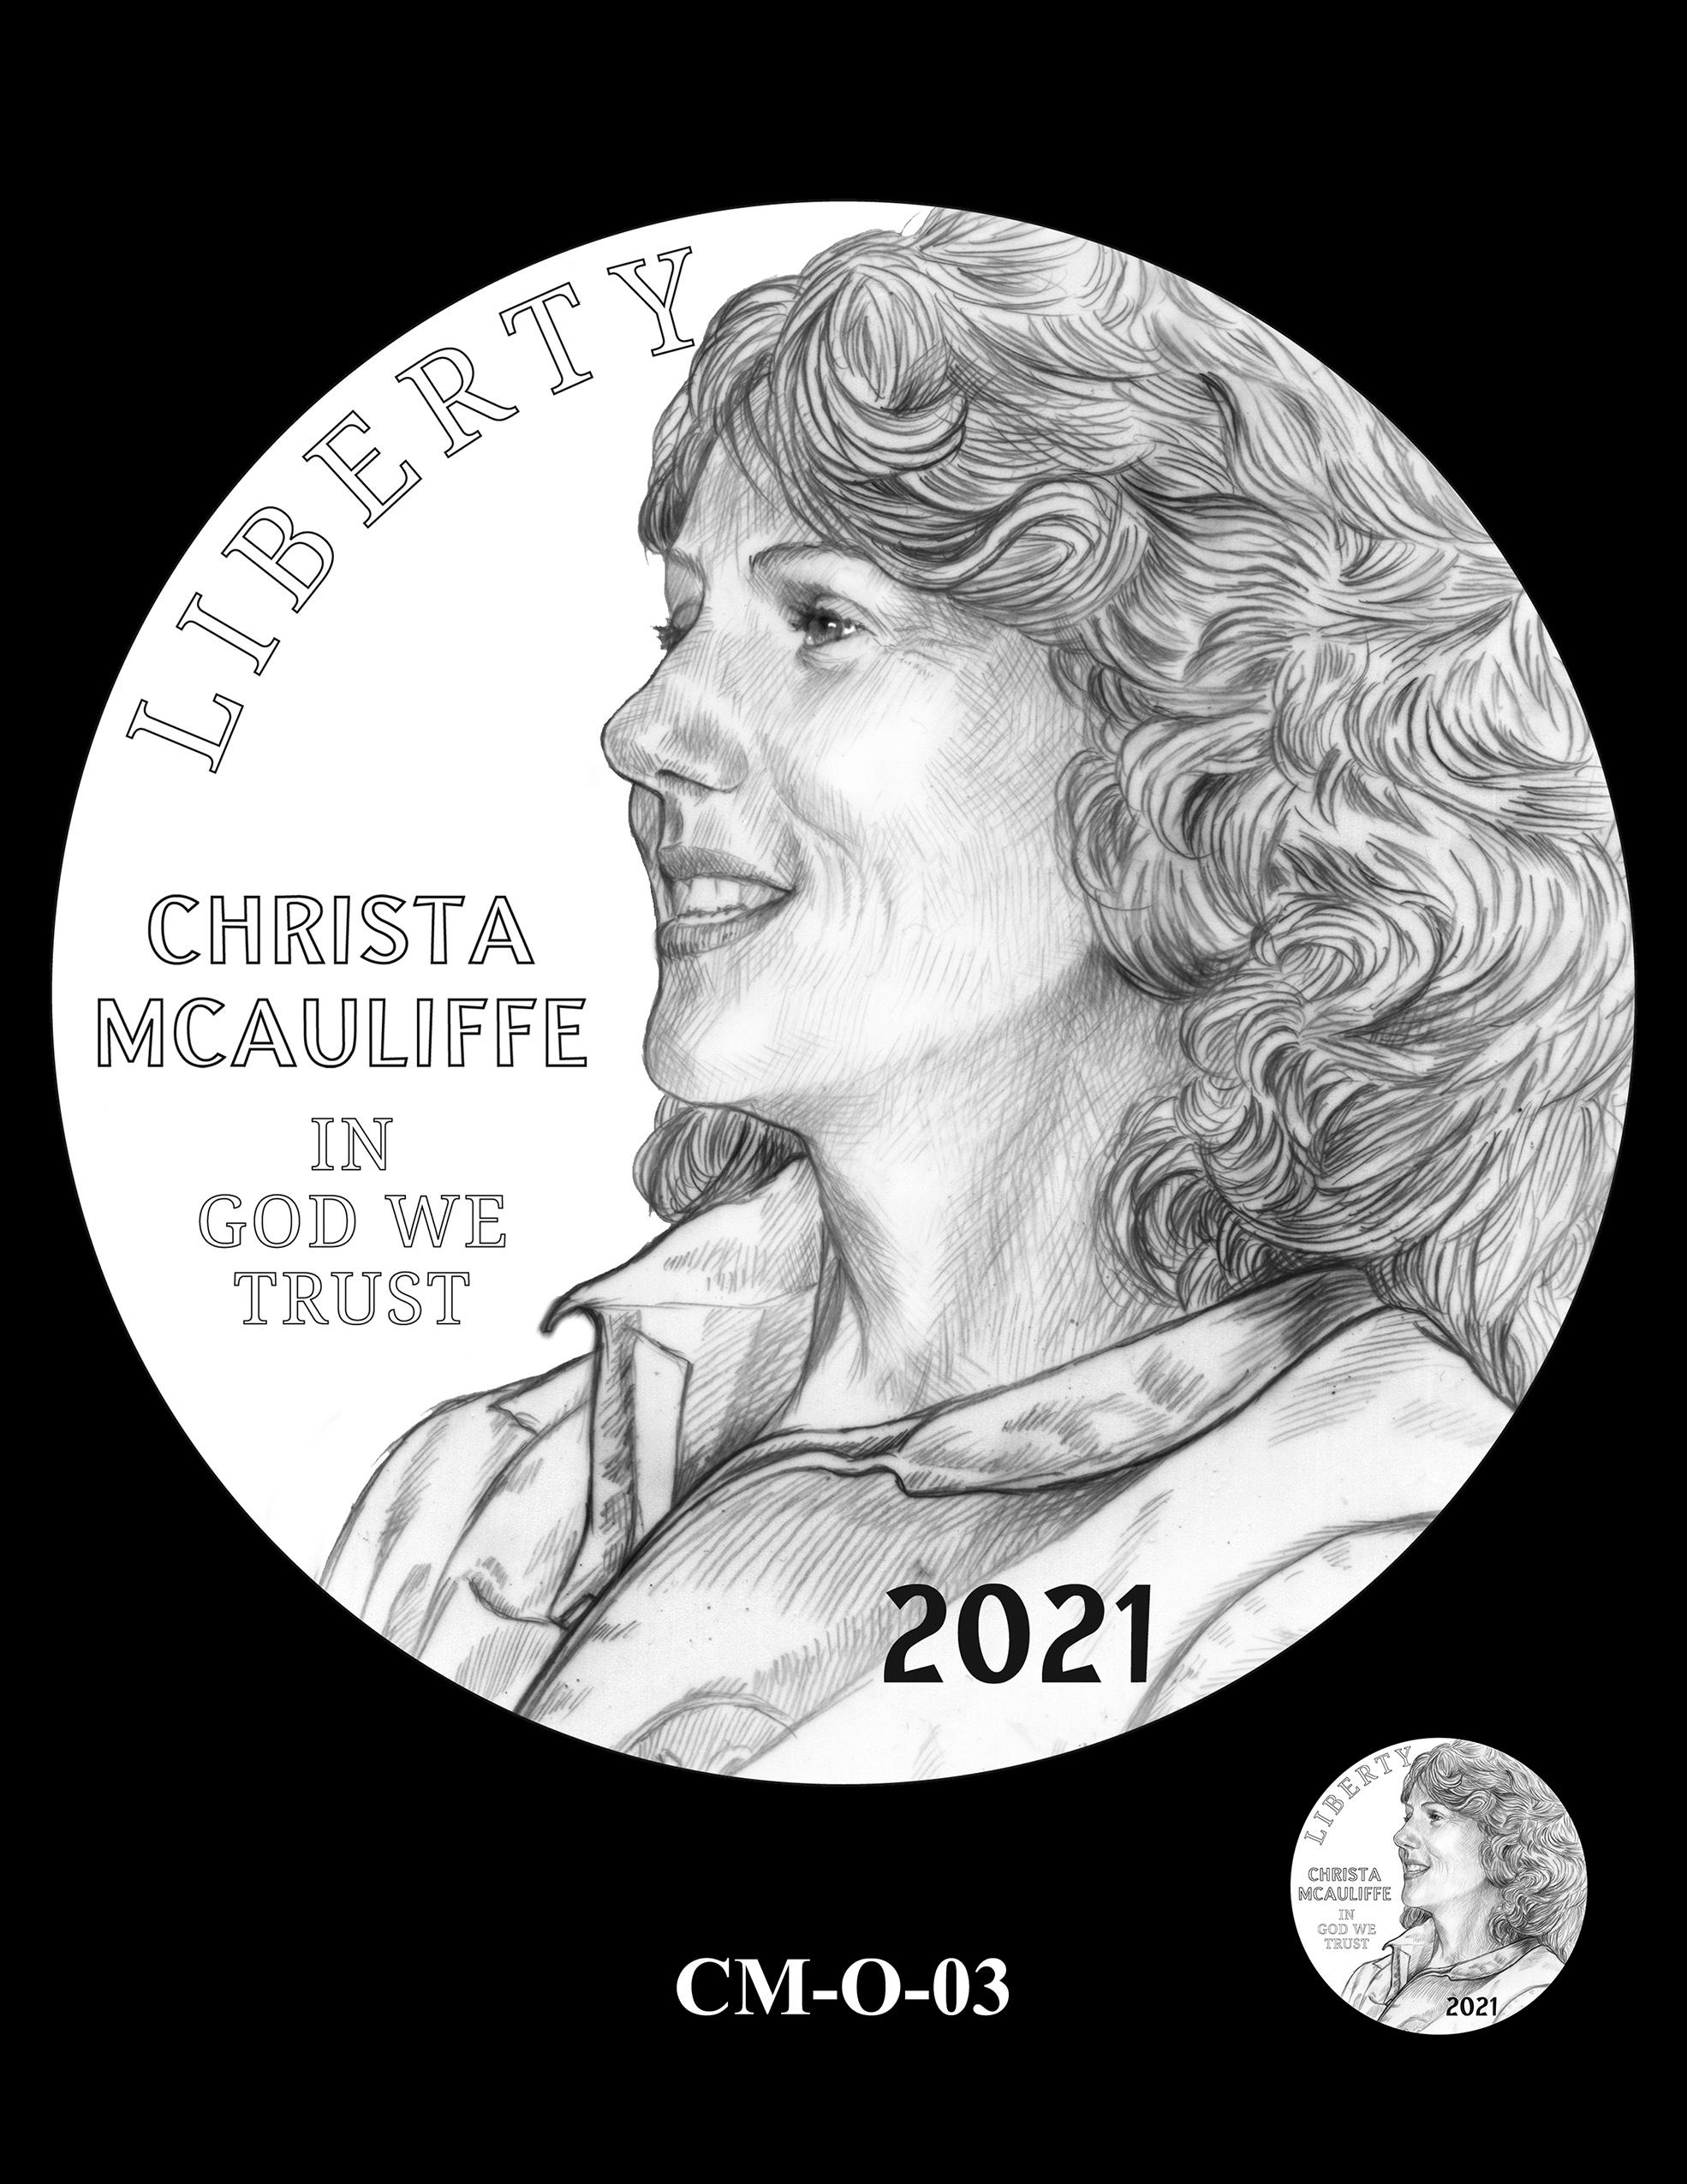 CM-O-03 -- 2021 Christa McAuliffe Commemorative Coin